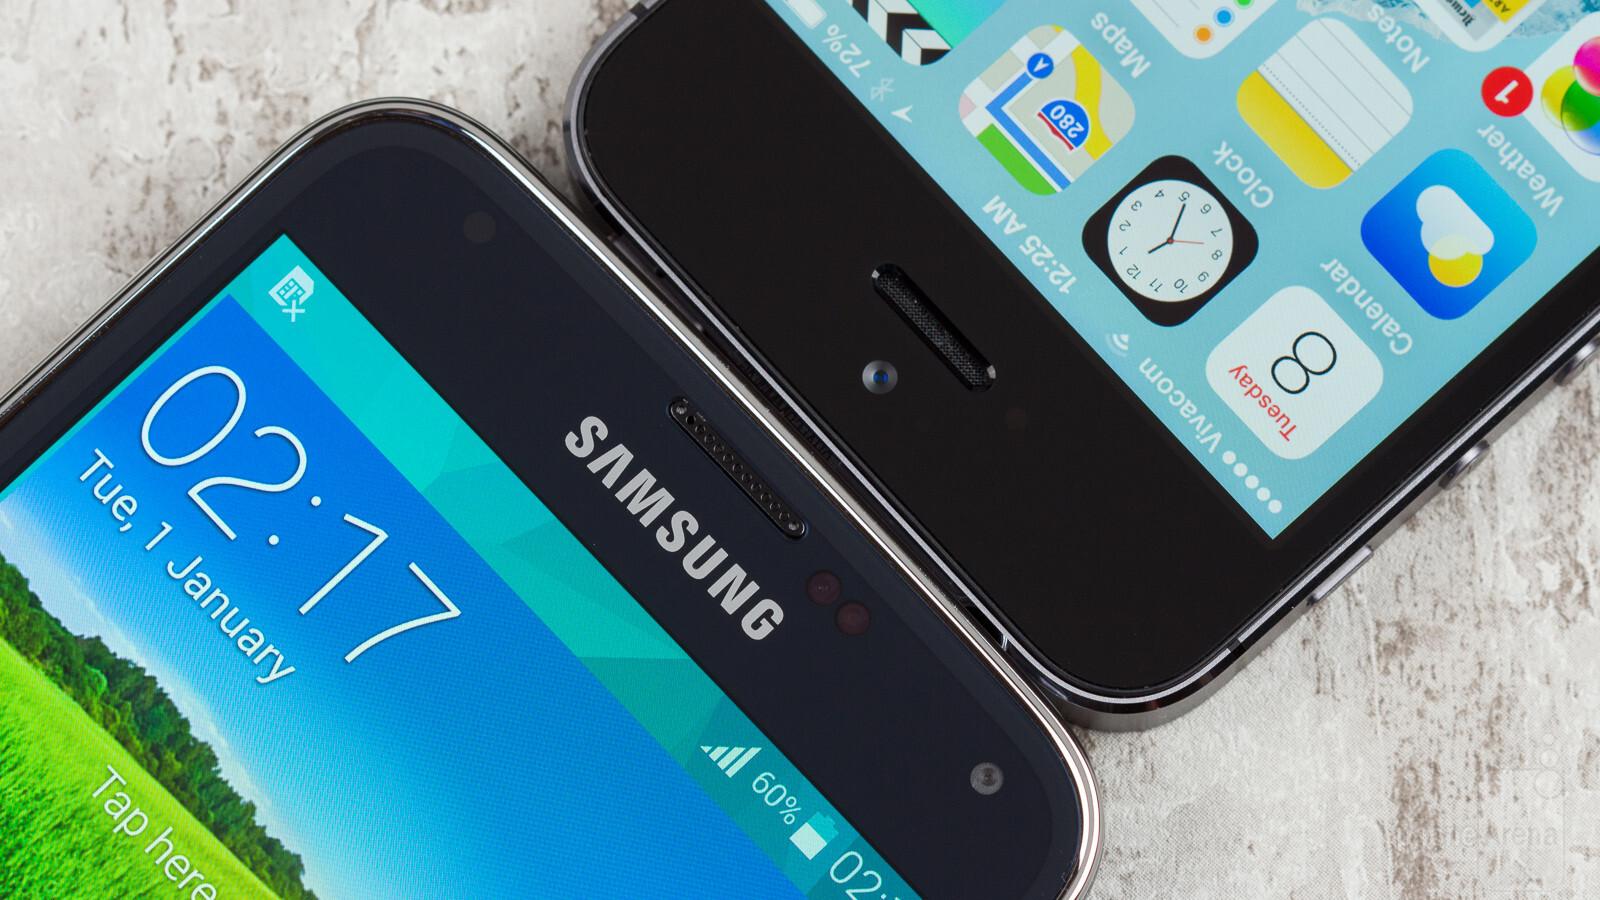 1fc9839e500 Samsung Galaxy S5 vs Apple iPhone 5S - PhoneArena